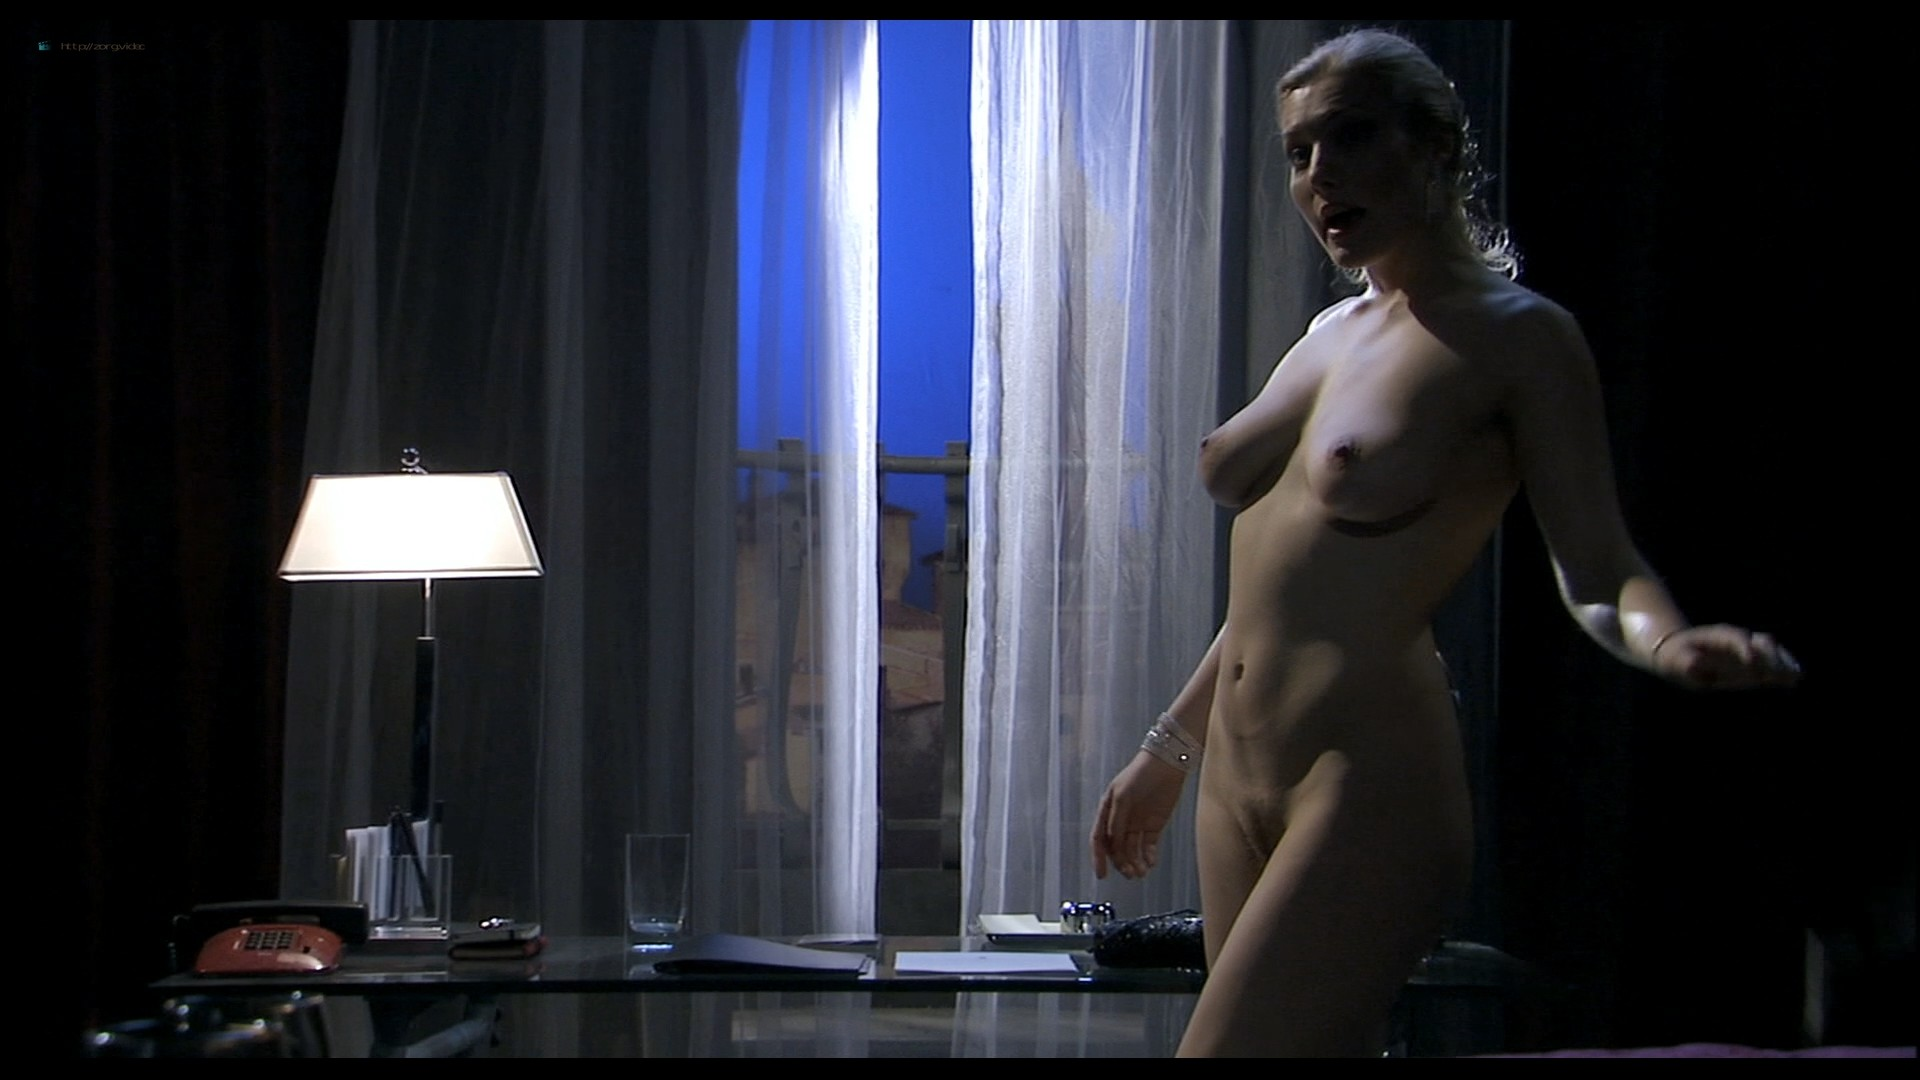 Anna Jimskaia nude explicit Nela Lucic nude - Monamour (2006) HD 1080p BluRay (r) (16)